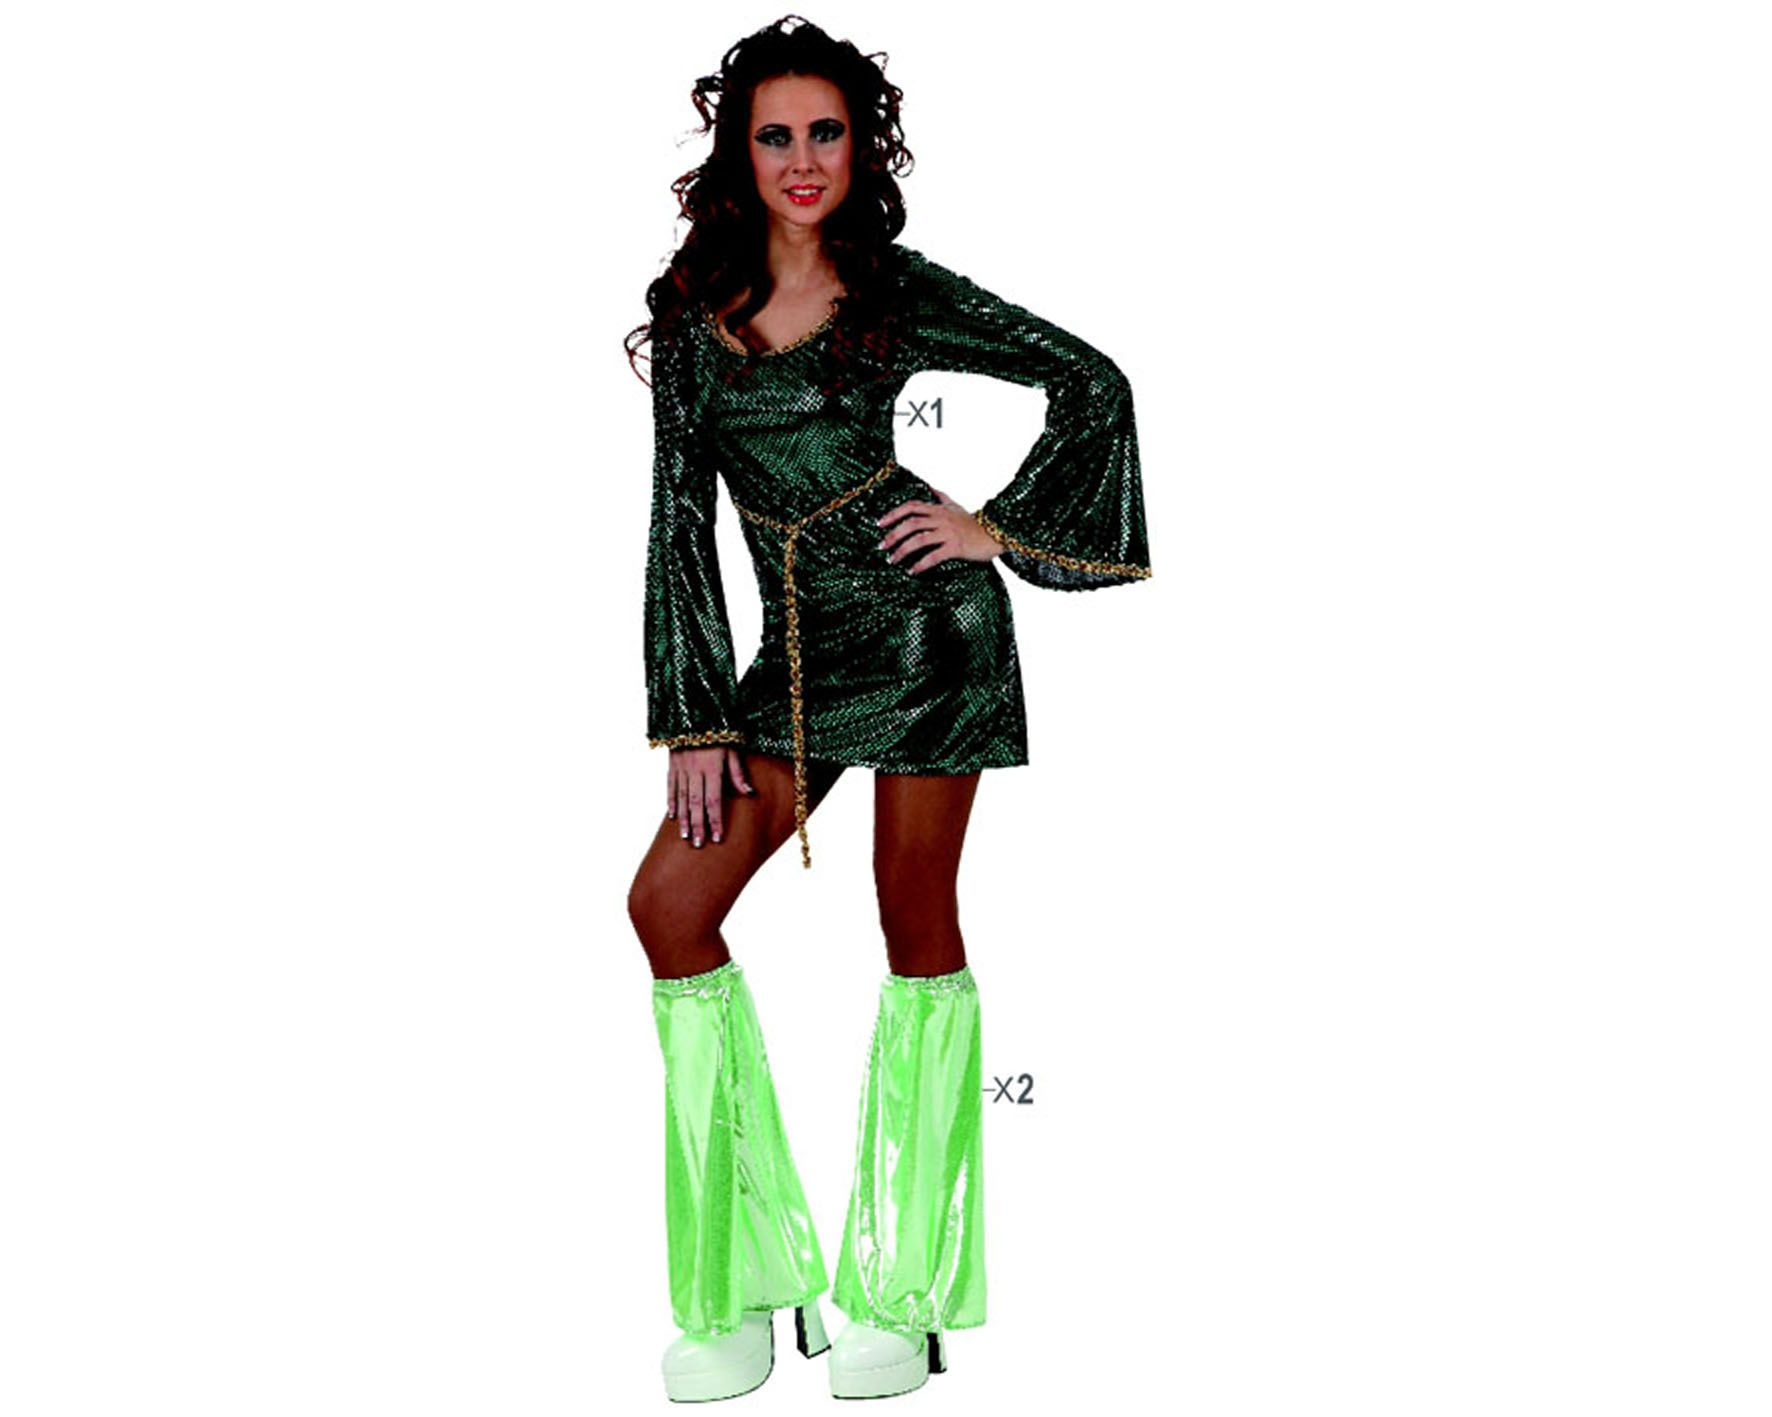 comprar disfraz disco verde talla m disfraces baratos a